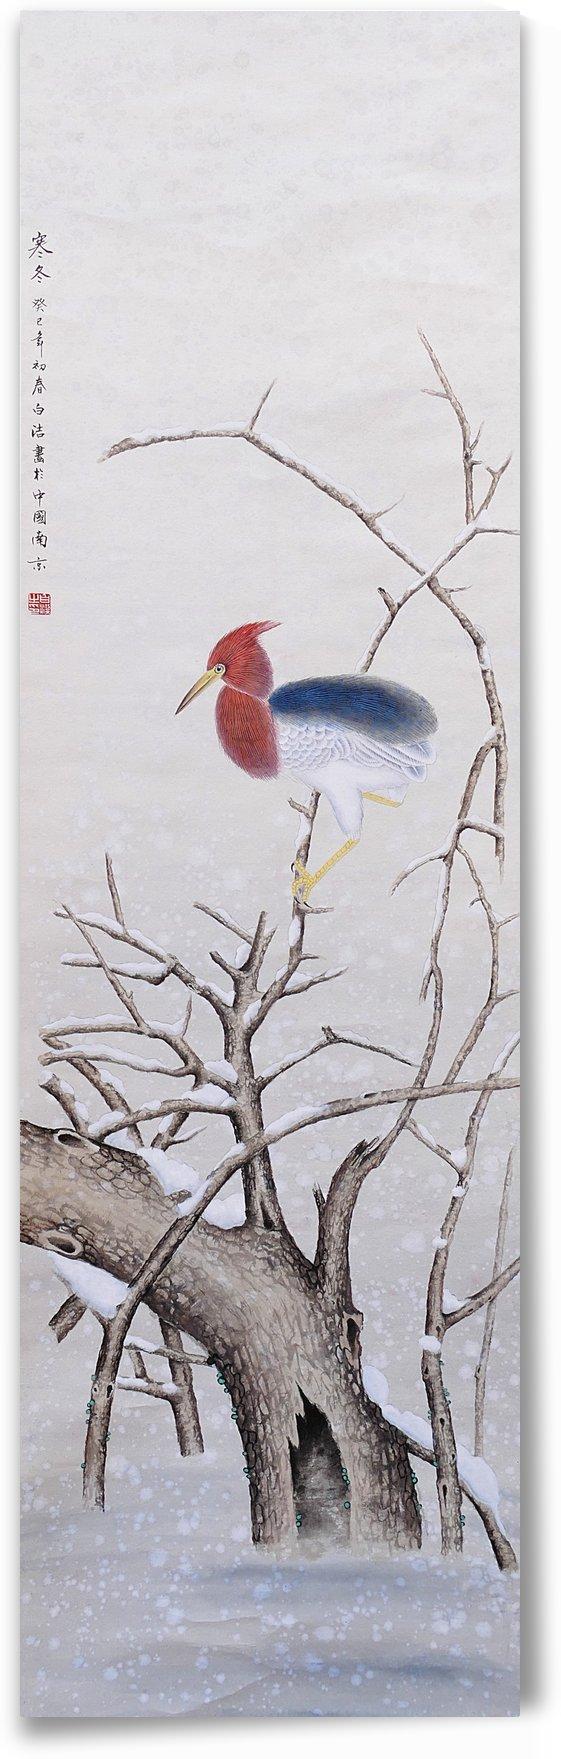 Winter Bird by Birgit Moldenhauer